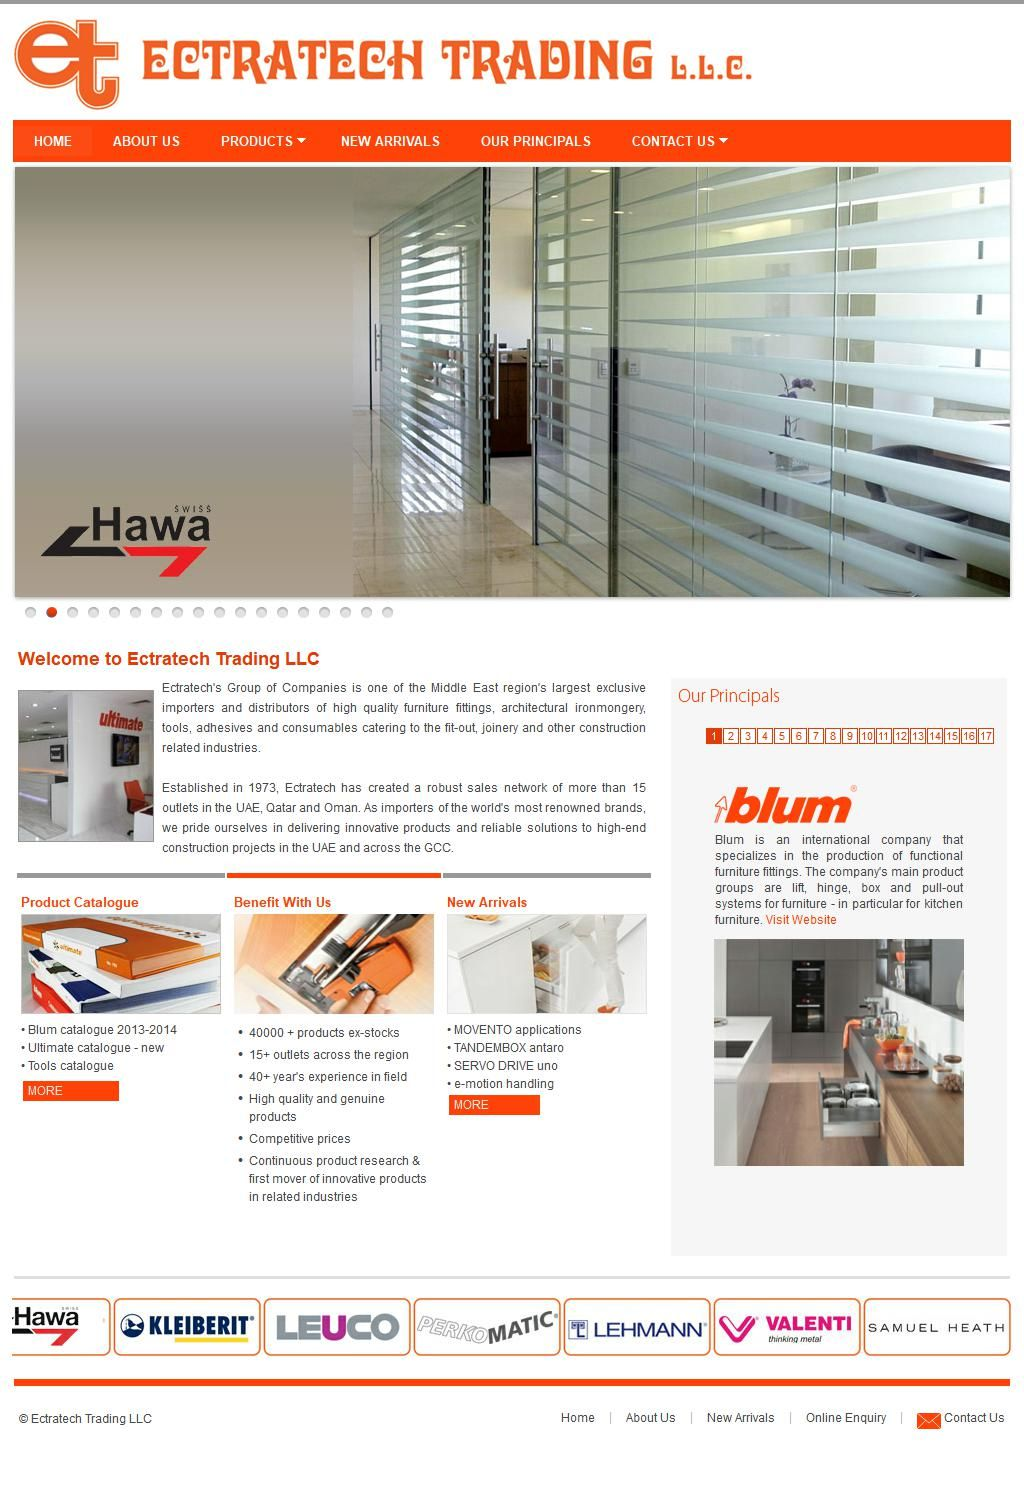 Ectratech Trading, Llc 12, Sikka 14a Naif -118, Deira, Dubai